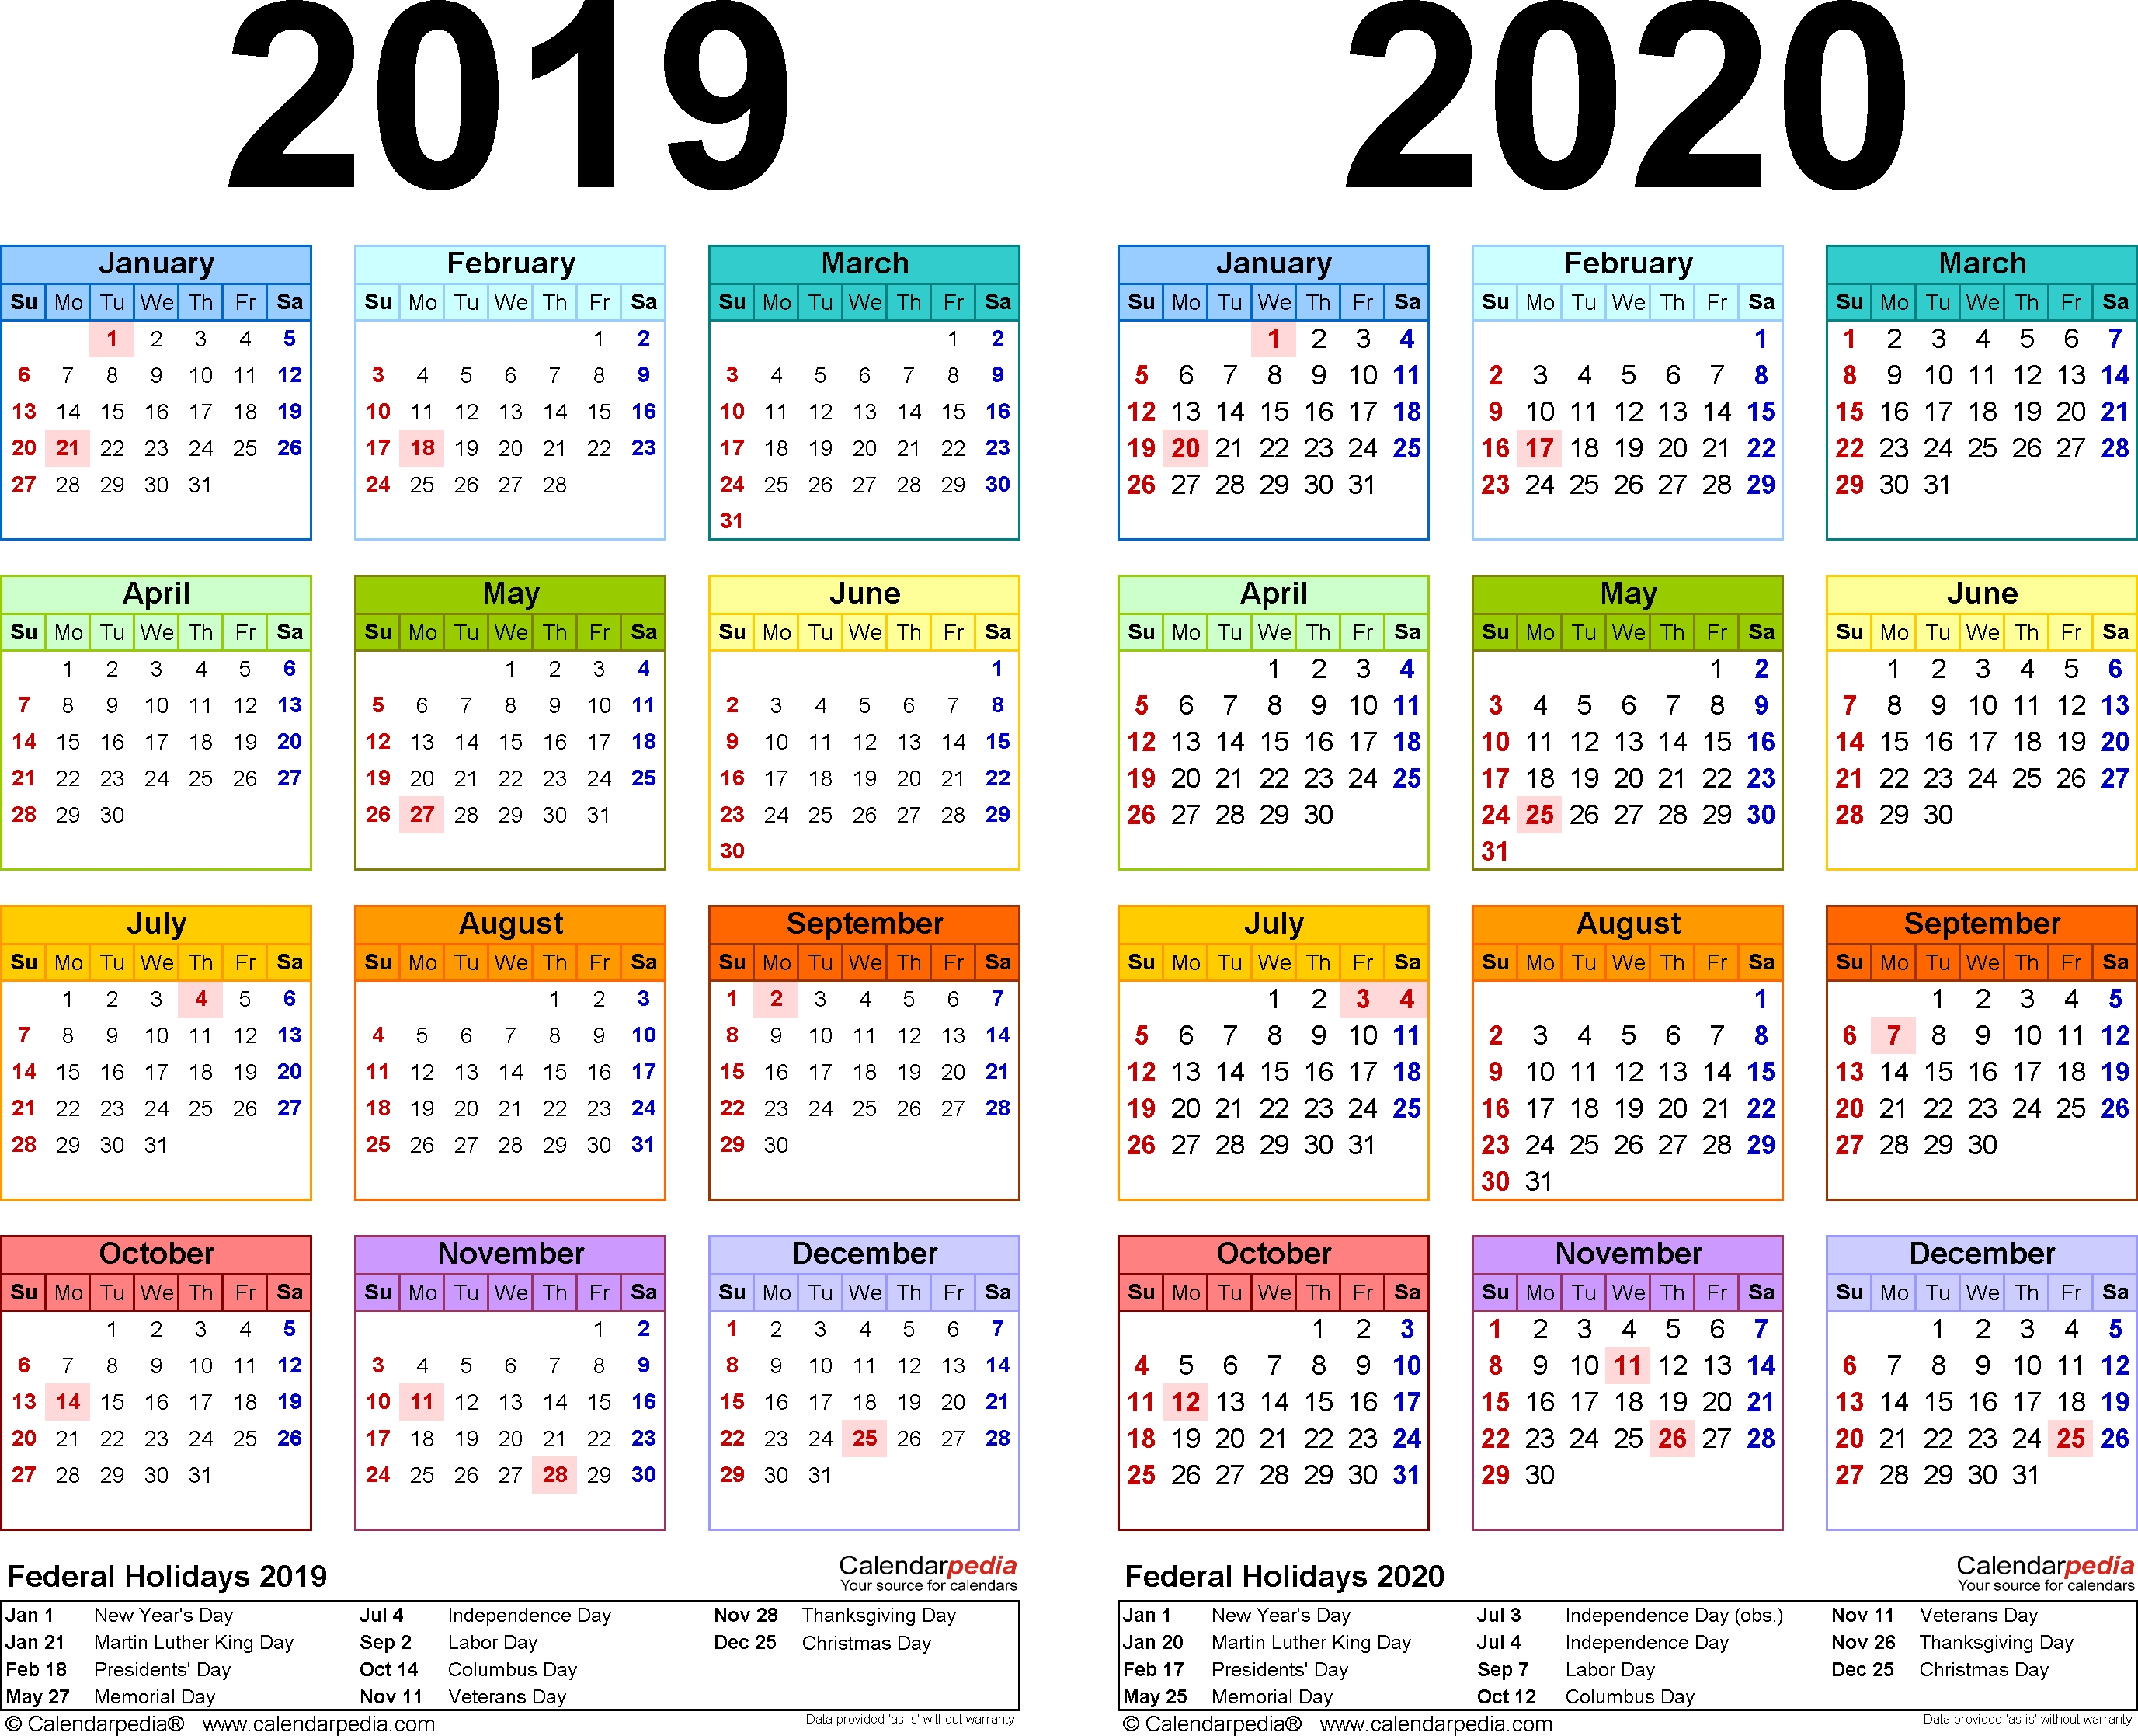 2019-2020 Calendar - Free Printable Two-Year Pdf Calendars pertaining to 2019-2020 Vacation Calendar